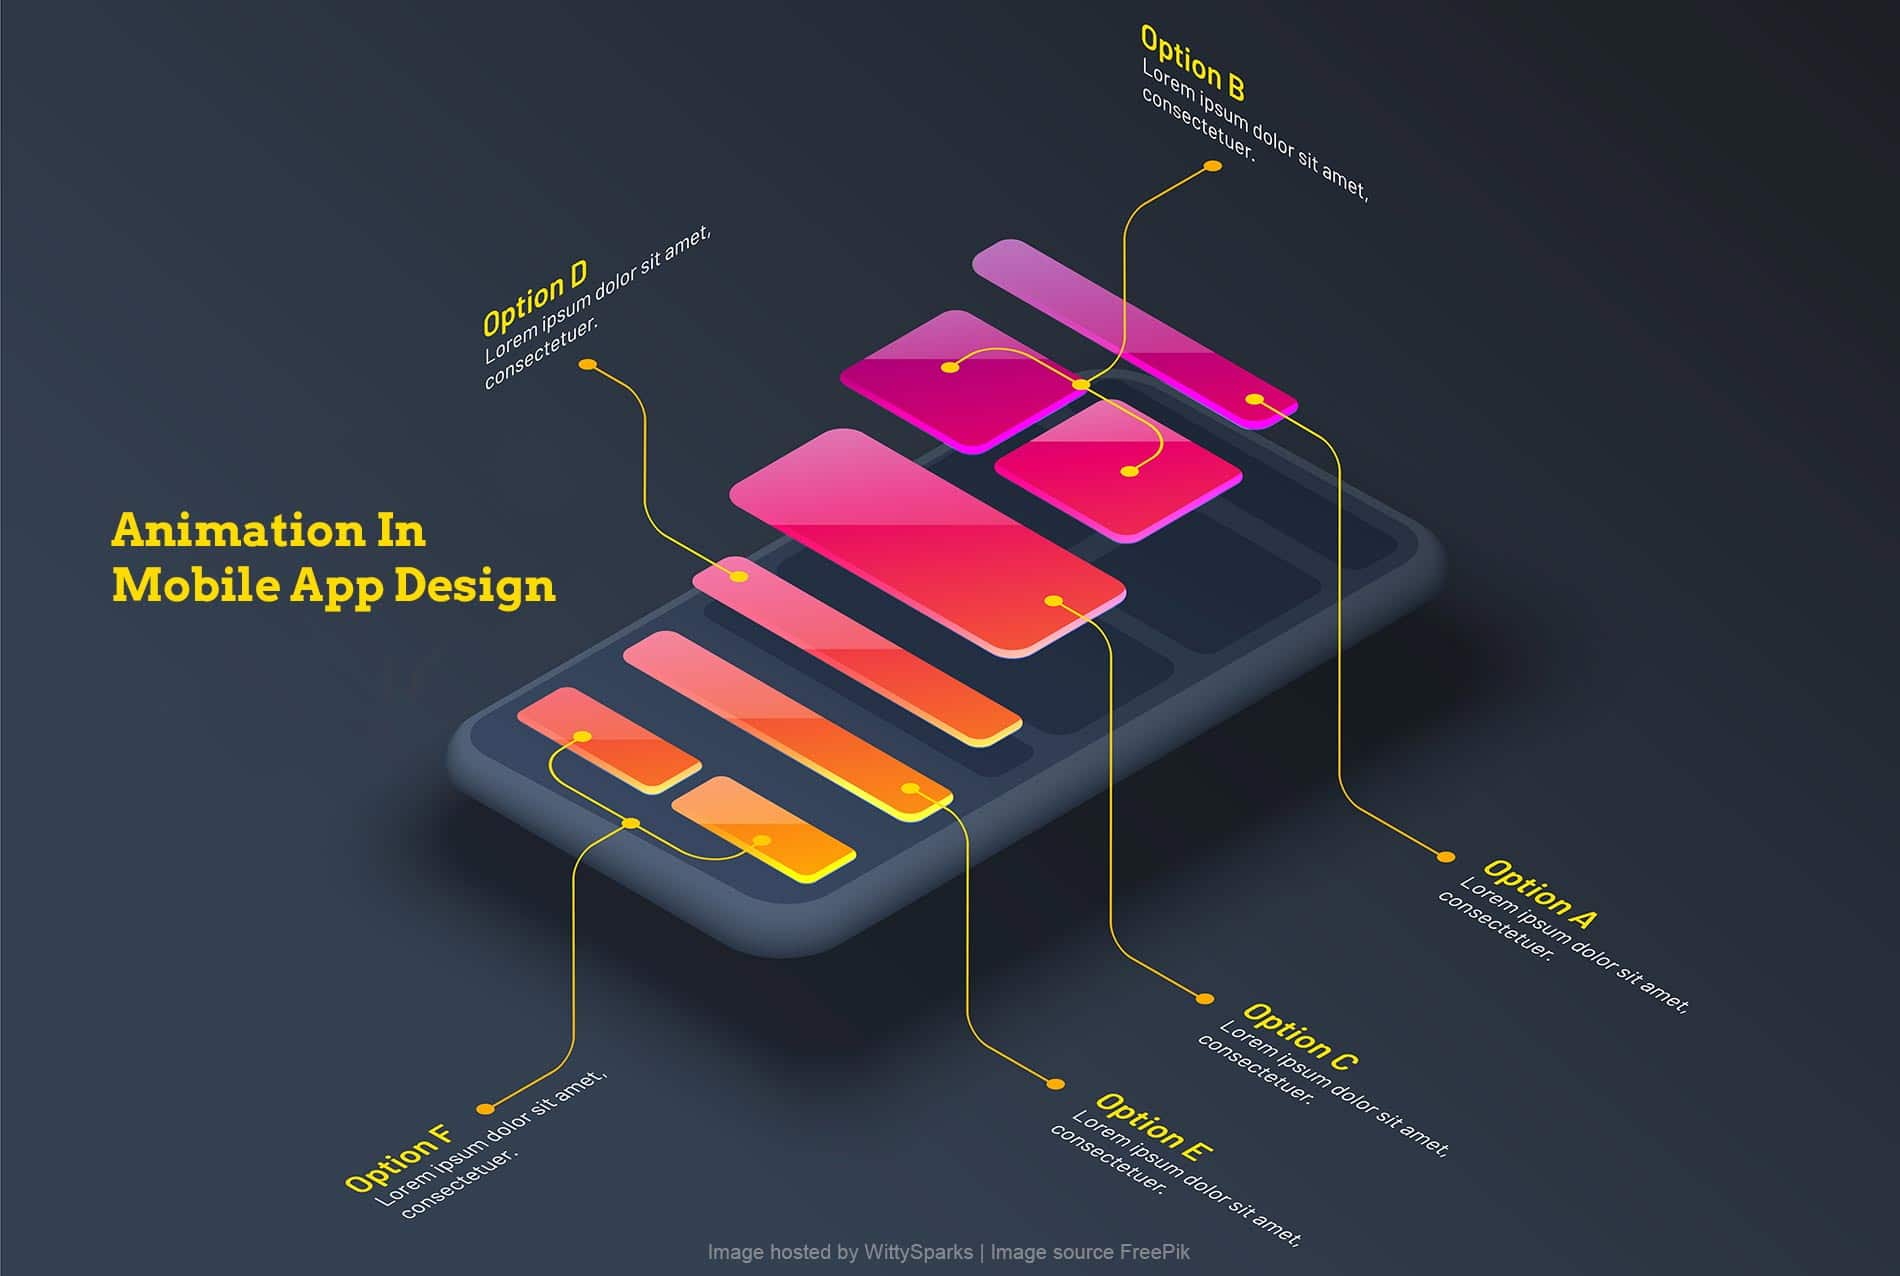 Animation in mobile app design